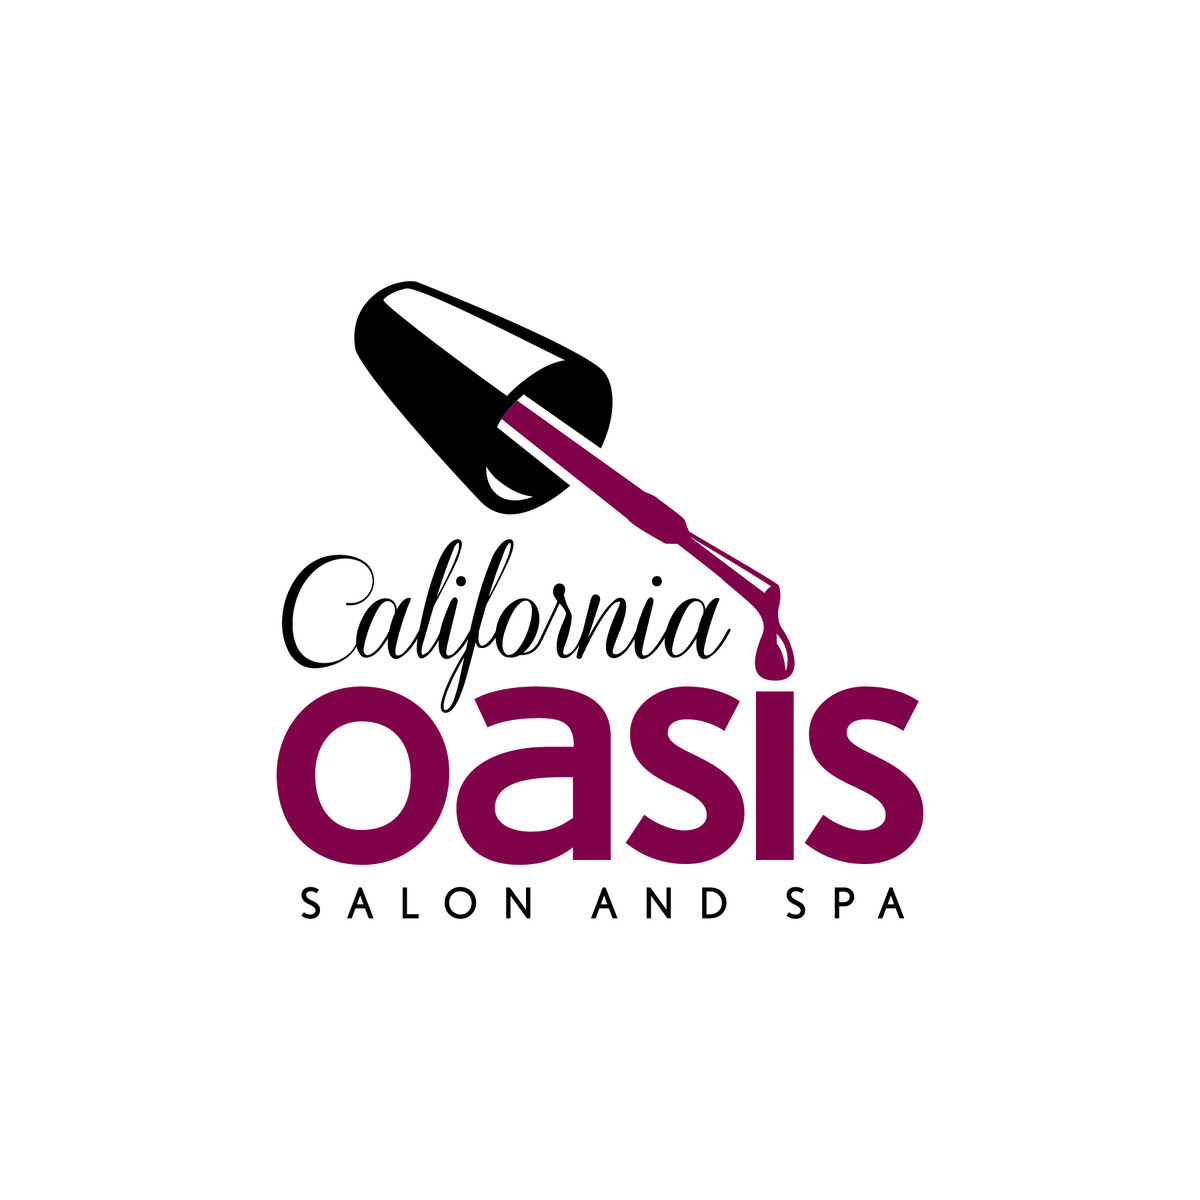 California Oasis Nail Salon Amp Spa Wedding Beauty Amp Health